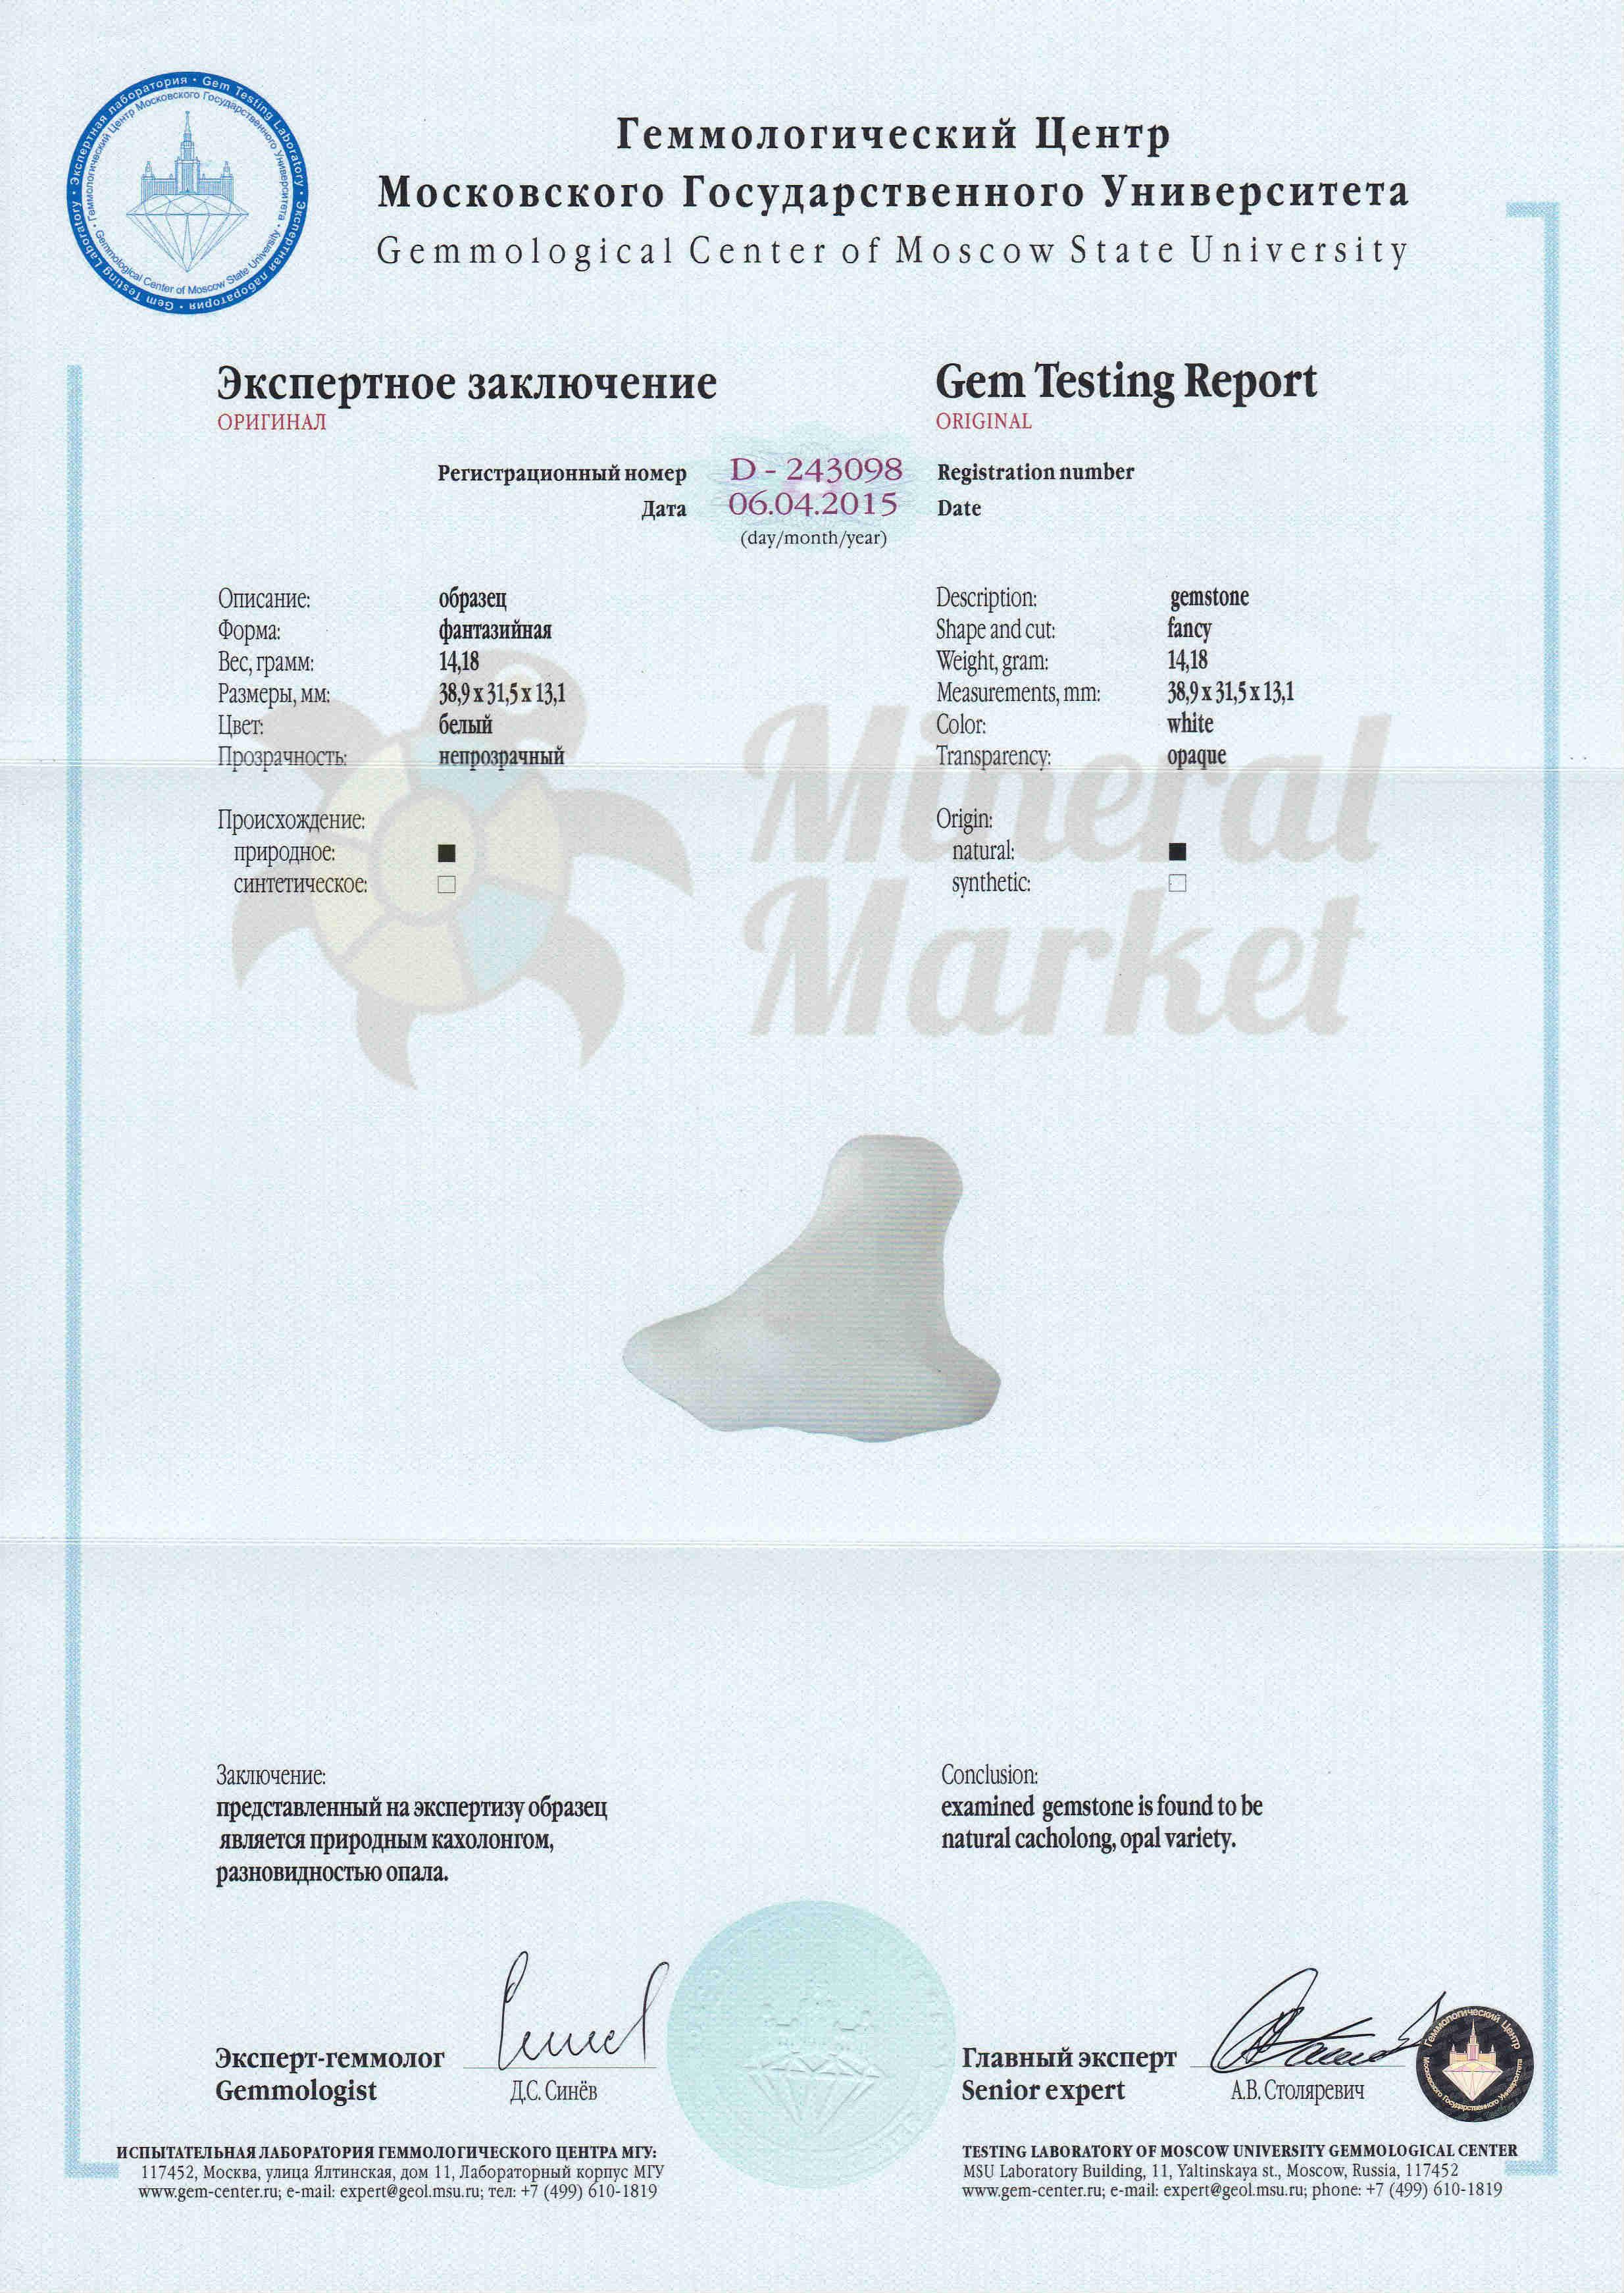 https://mineralmarket.ru/img/certificate/56/56.jpg